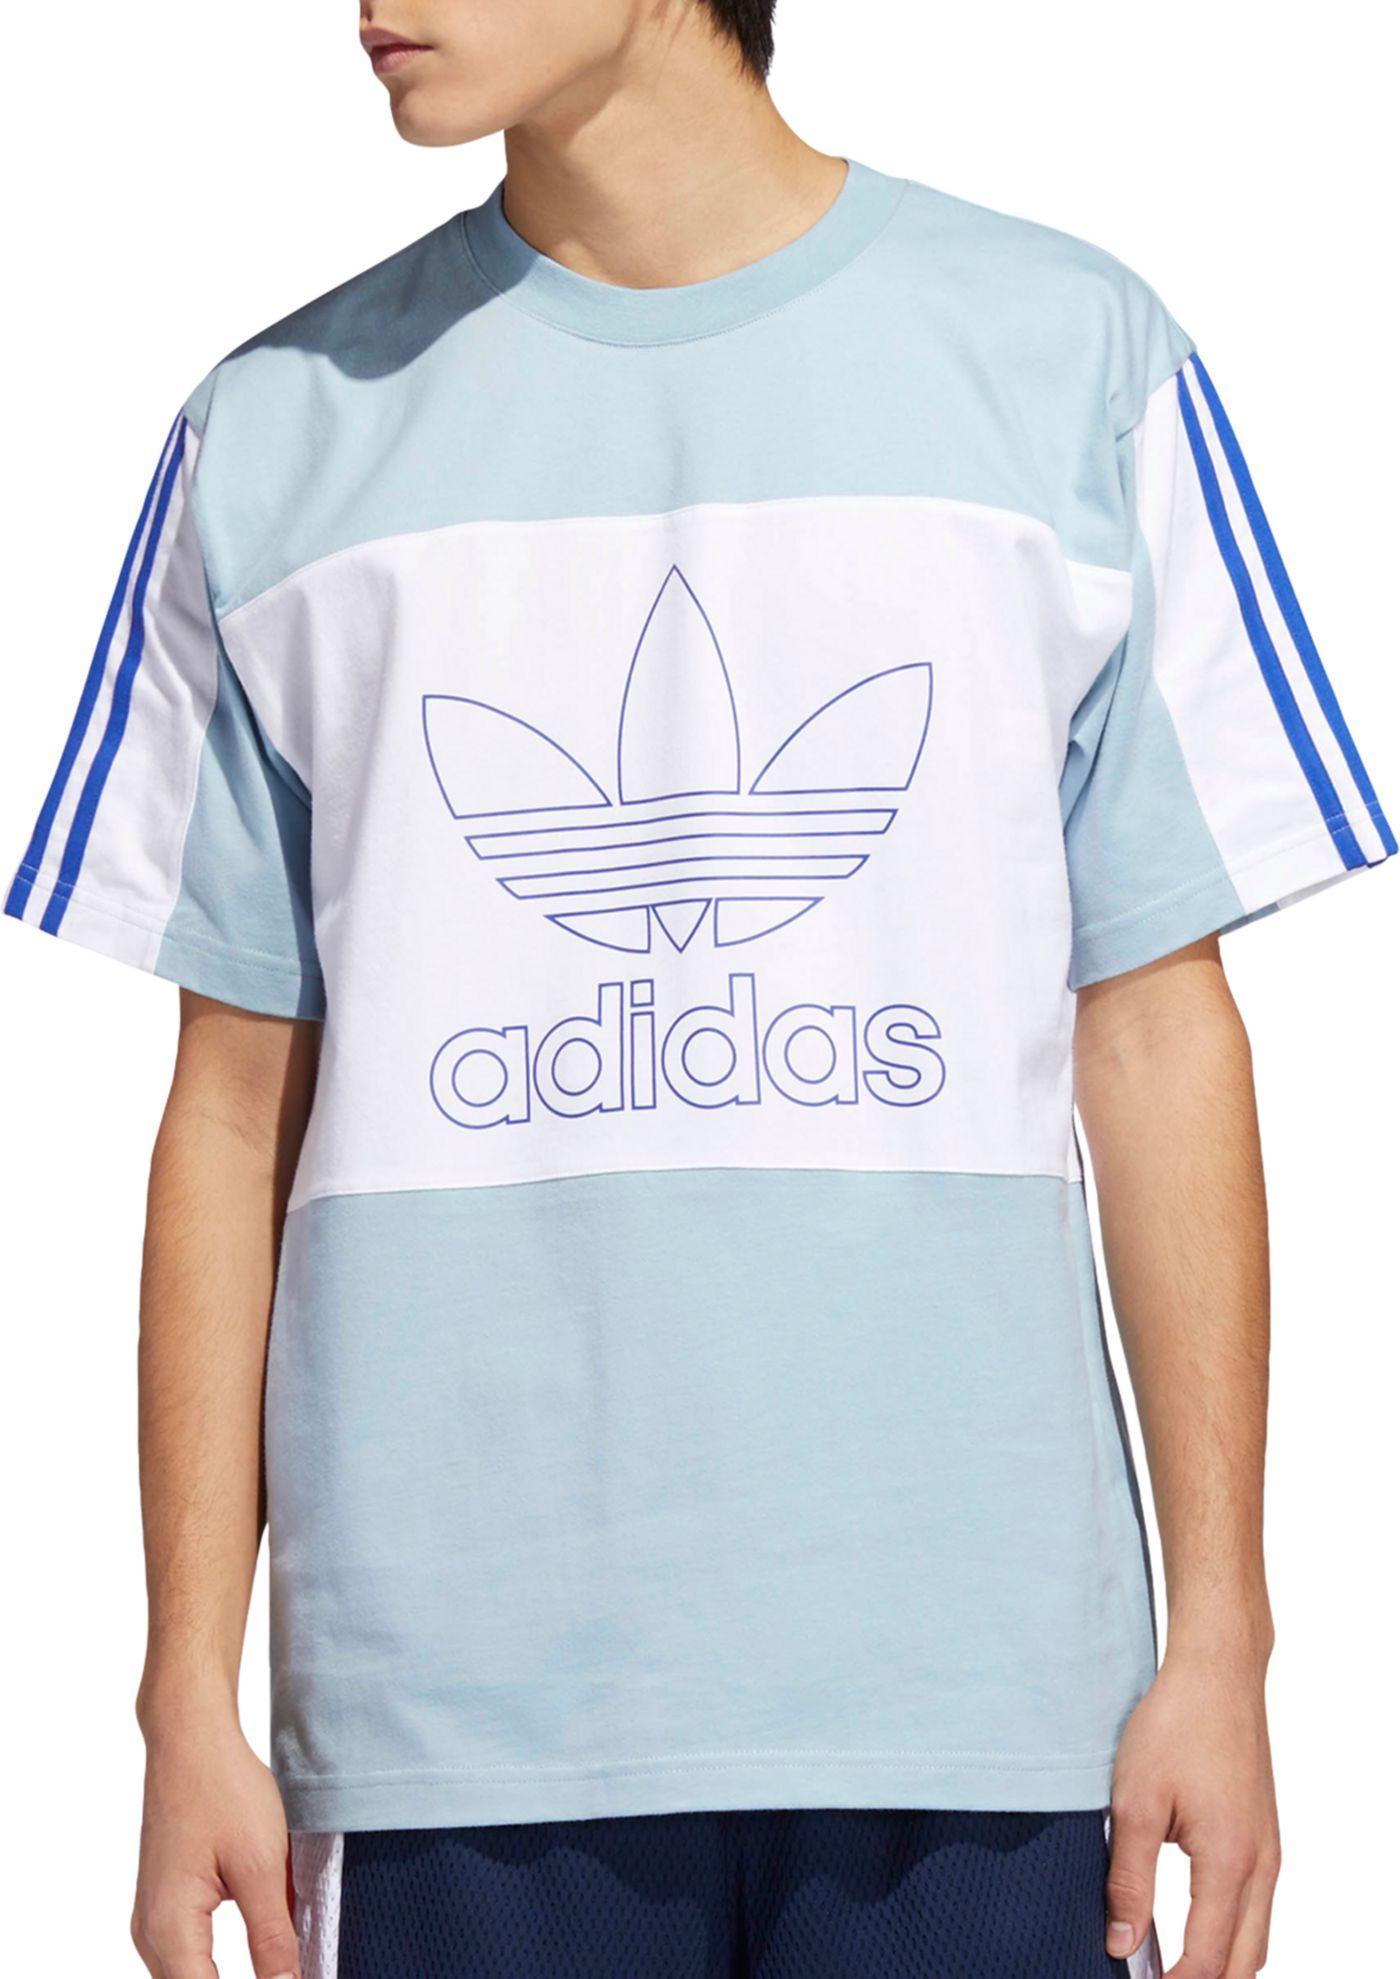 adidas Originals Men's Outline Graphic T-Shirt